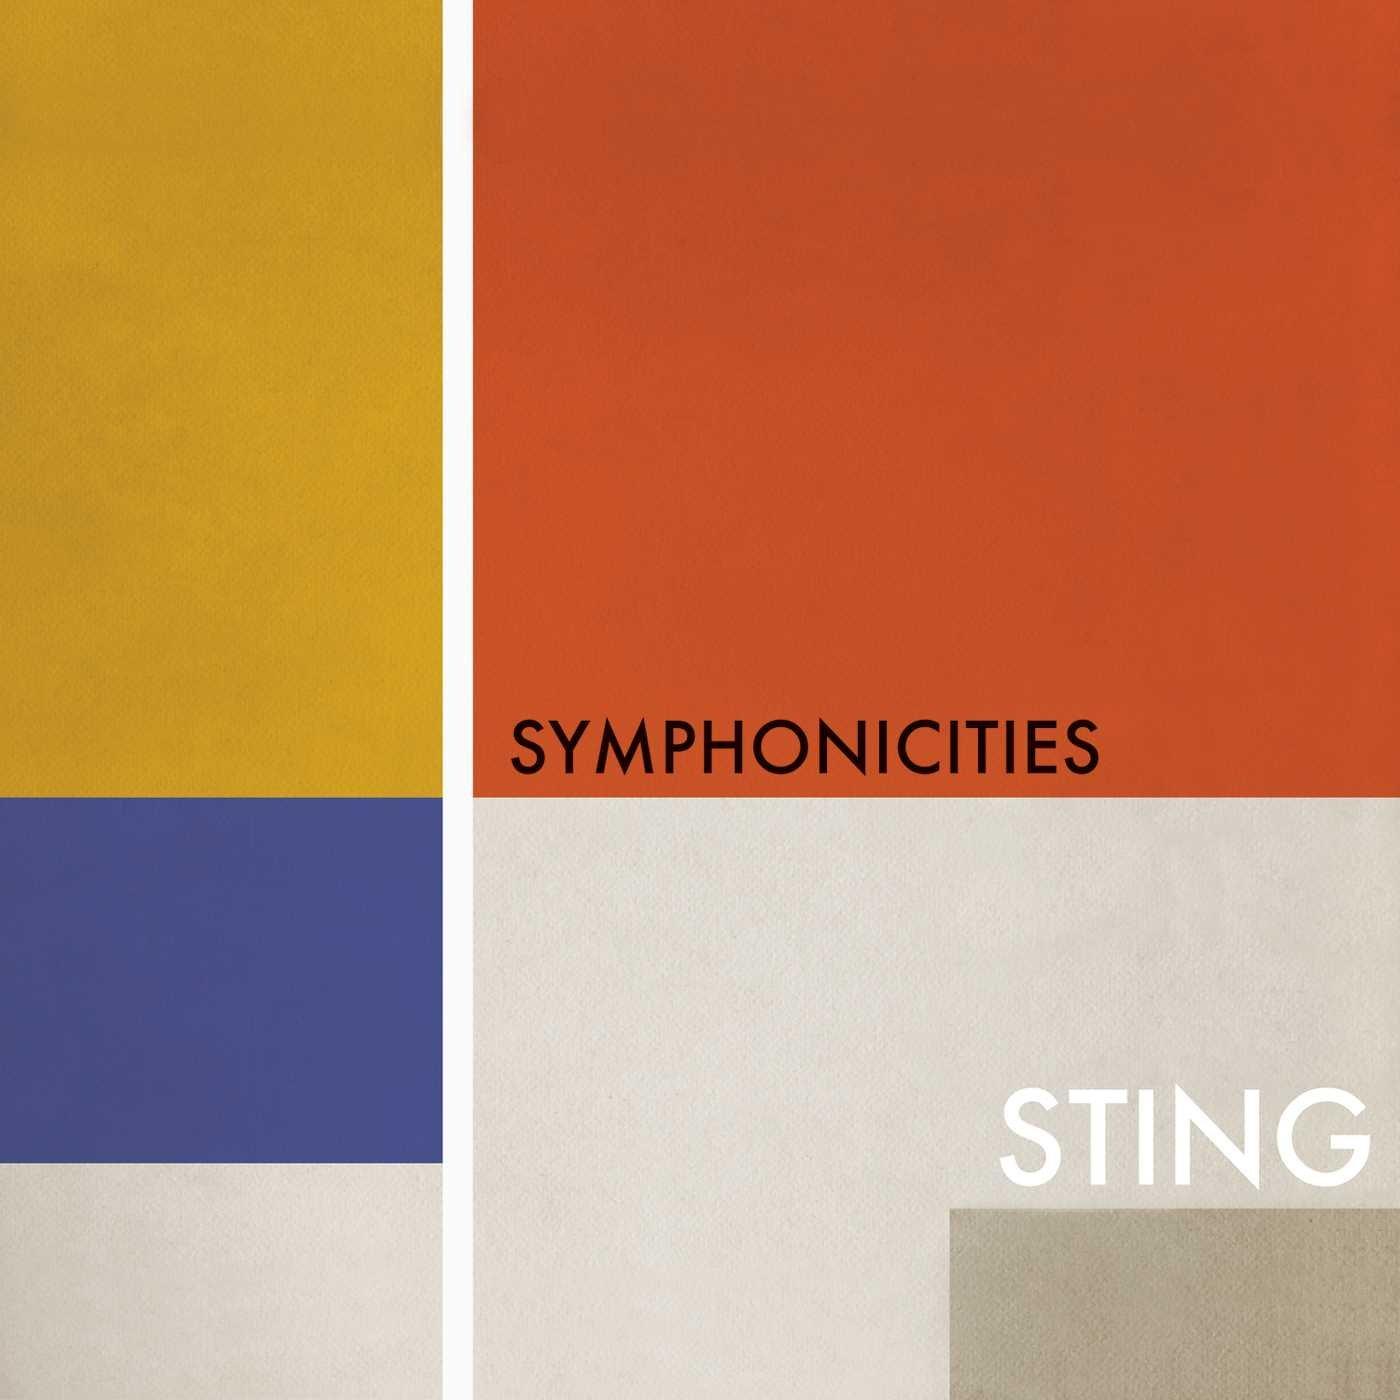 Sting - Symphonicities - Amazon.com Music